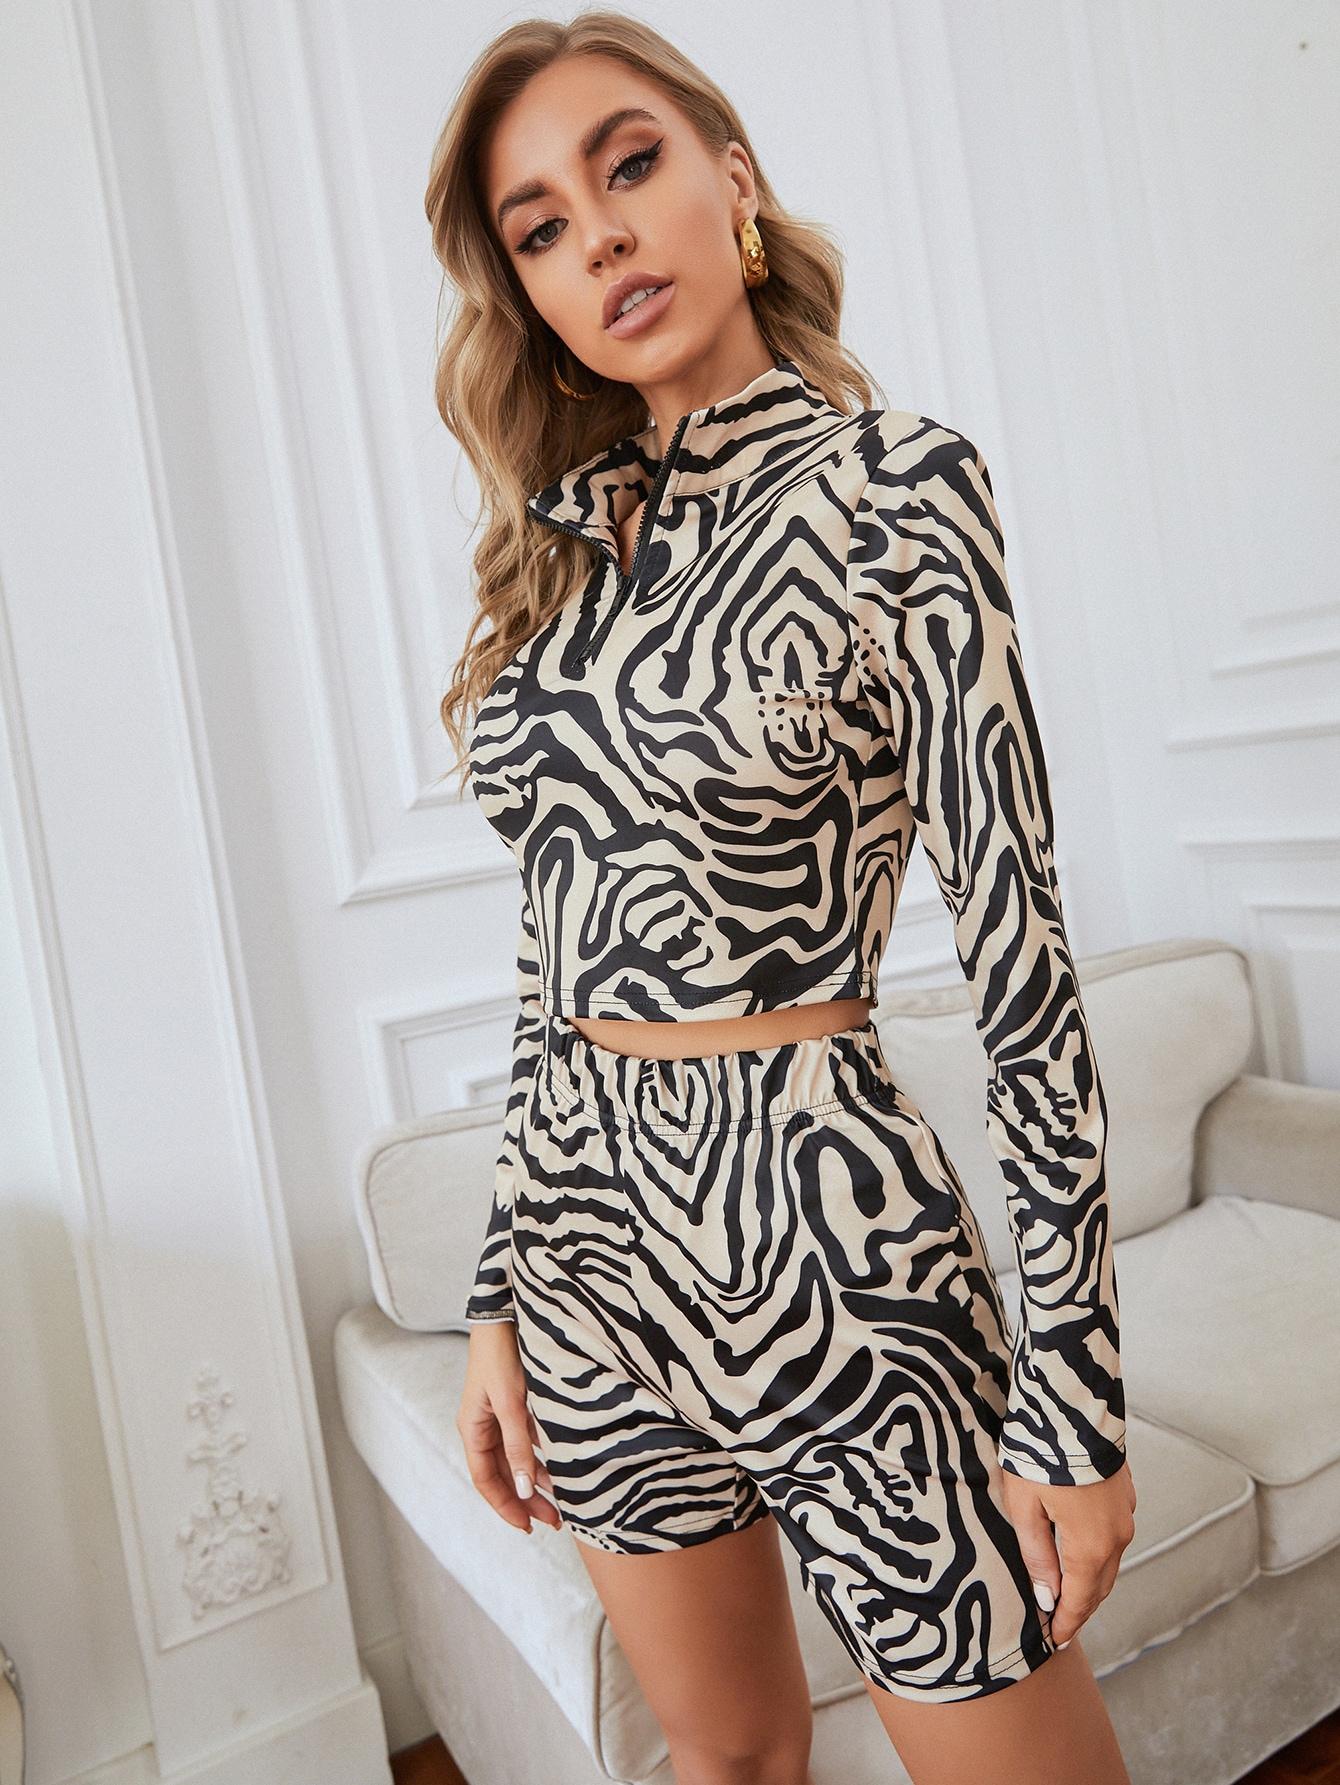 zebra striped half zip top with shorts